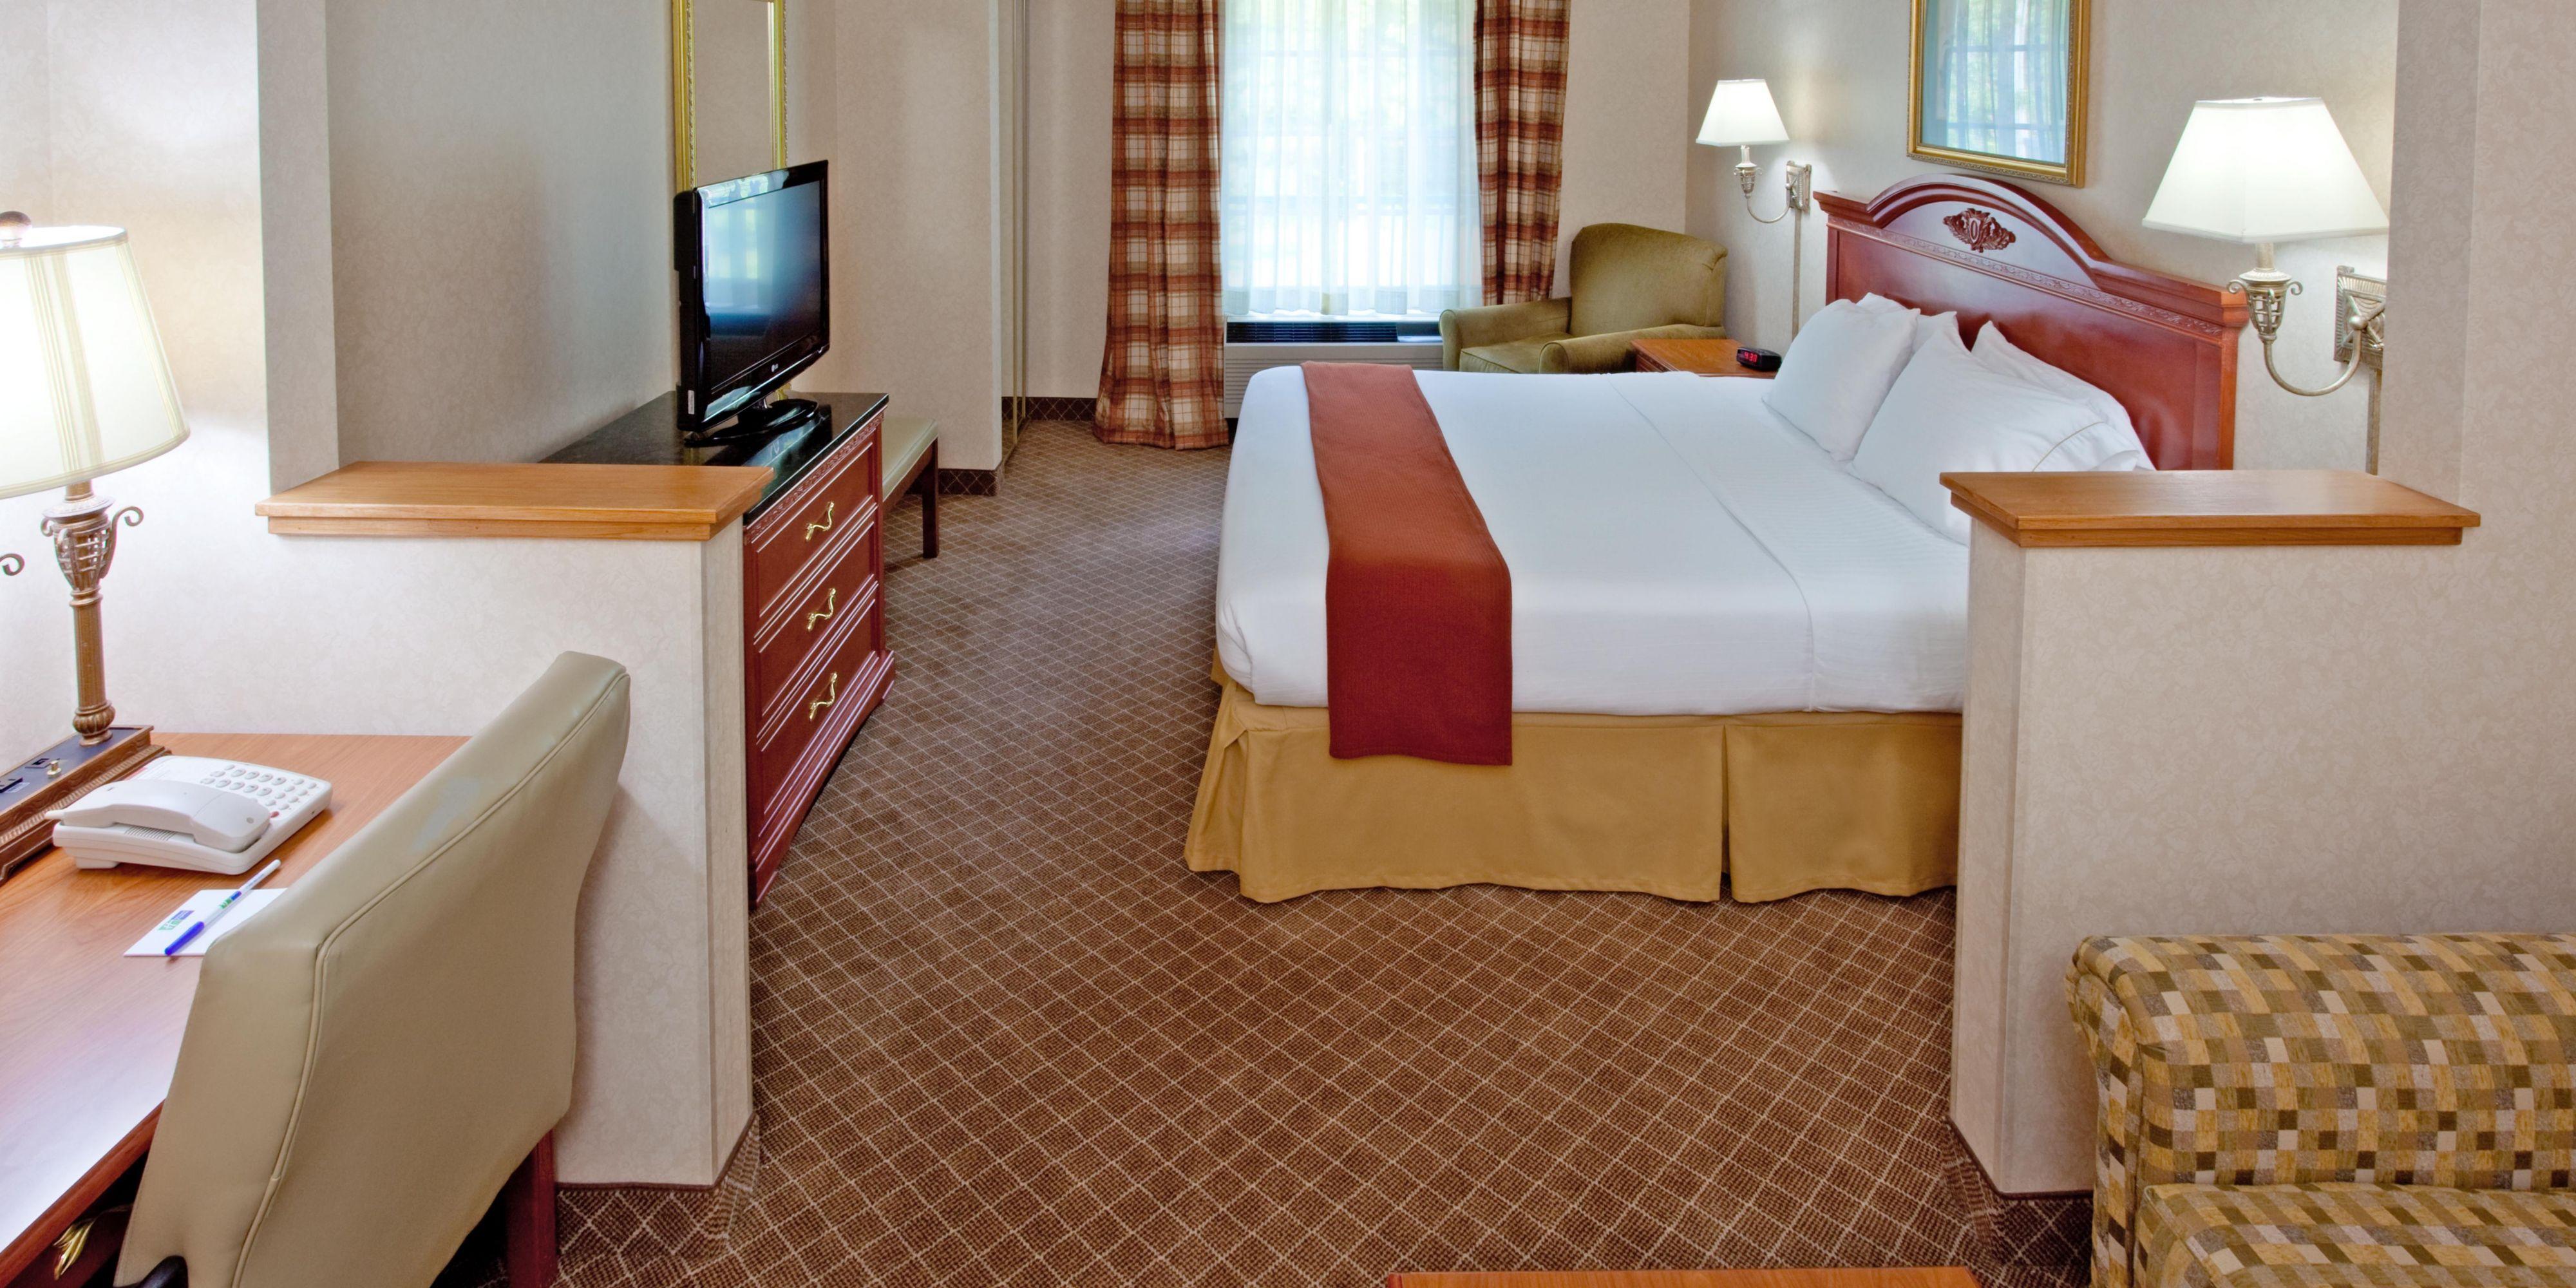 Holiday Inn Express & Suites Mount Arlington-Rockaway Area Hotel by IHG